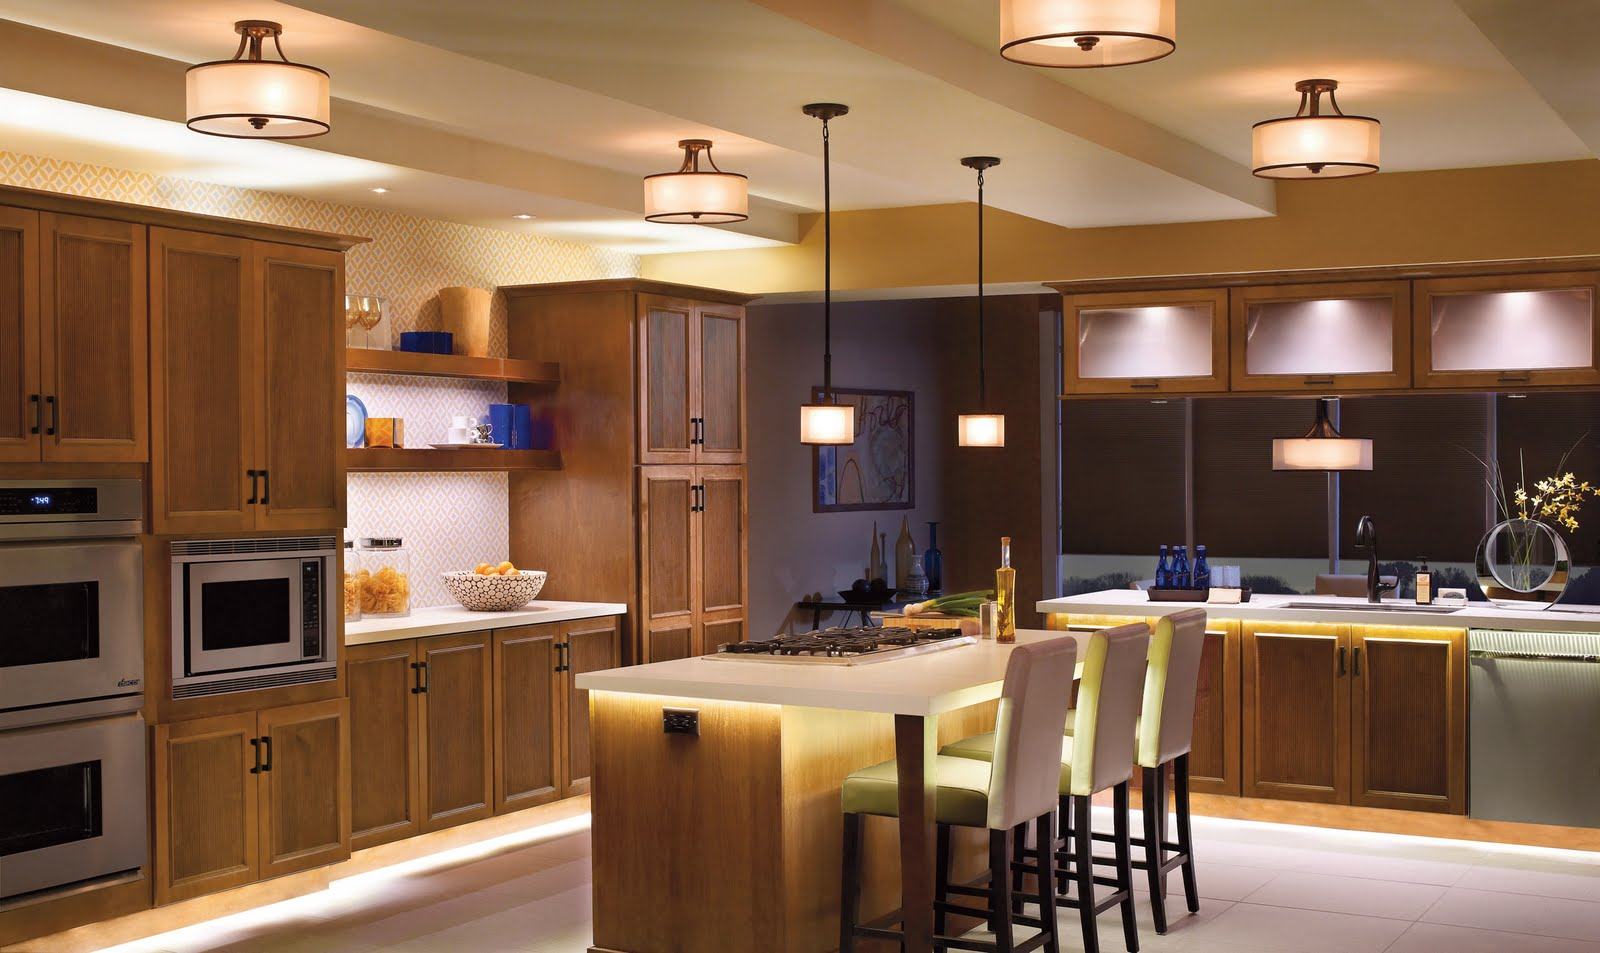 Kitchen wall lighting Photo - 5